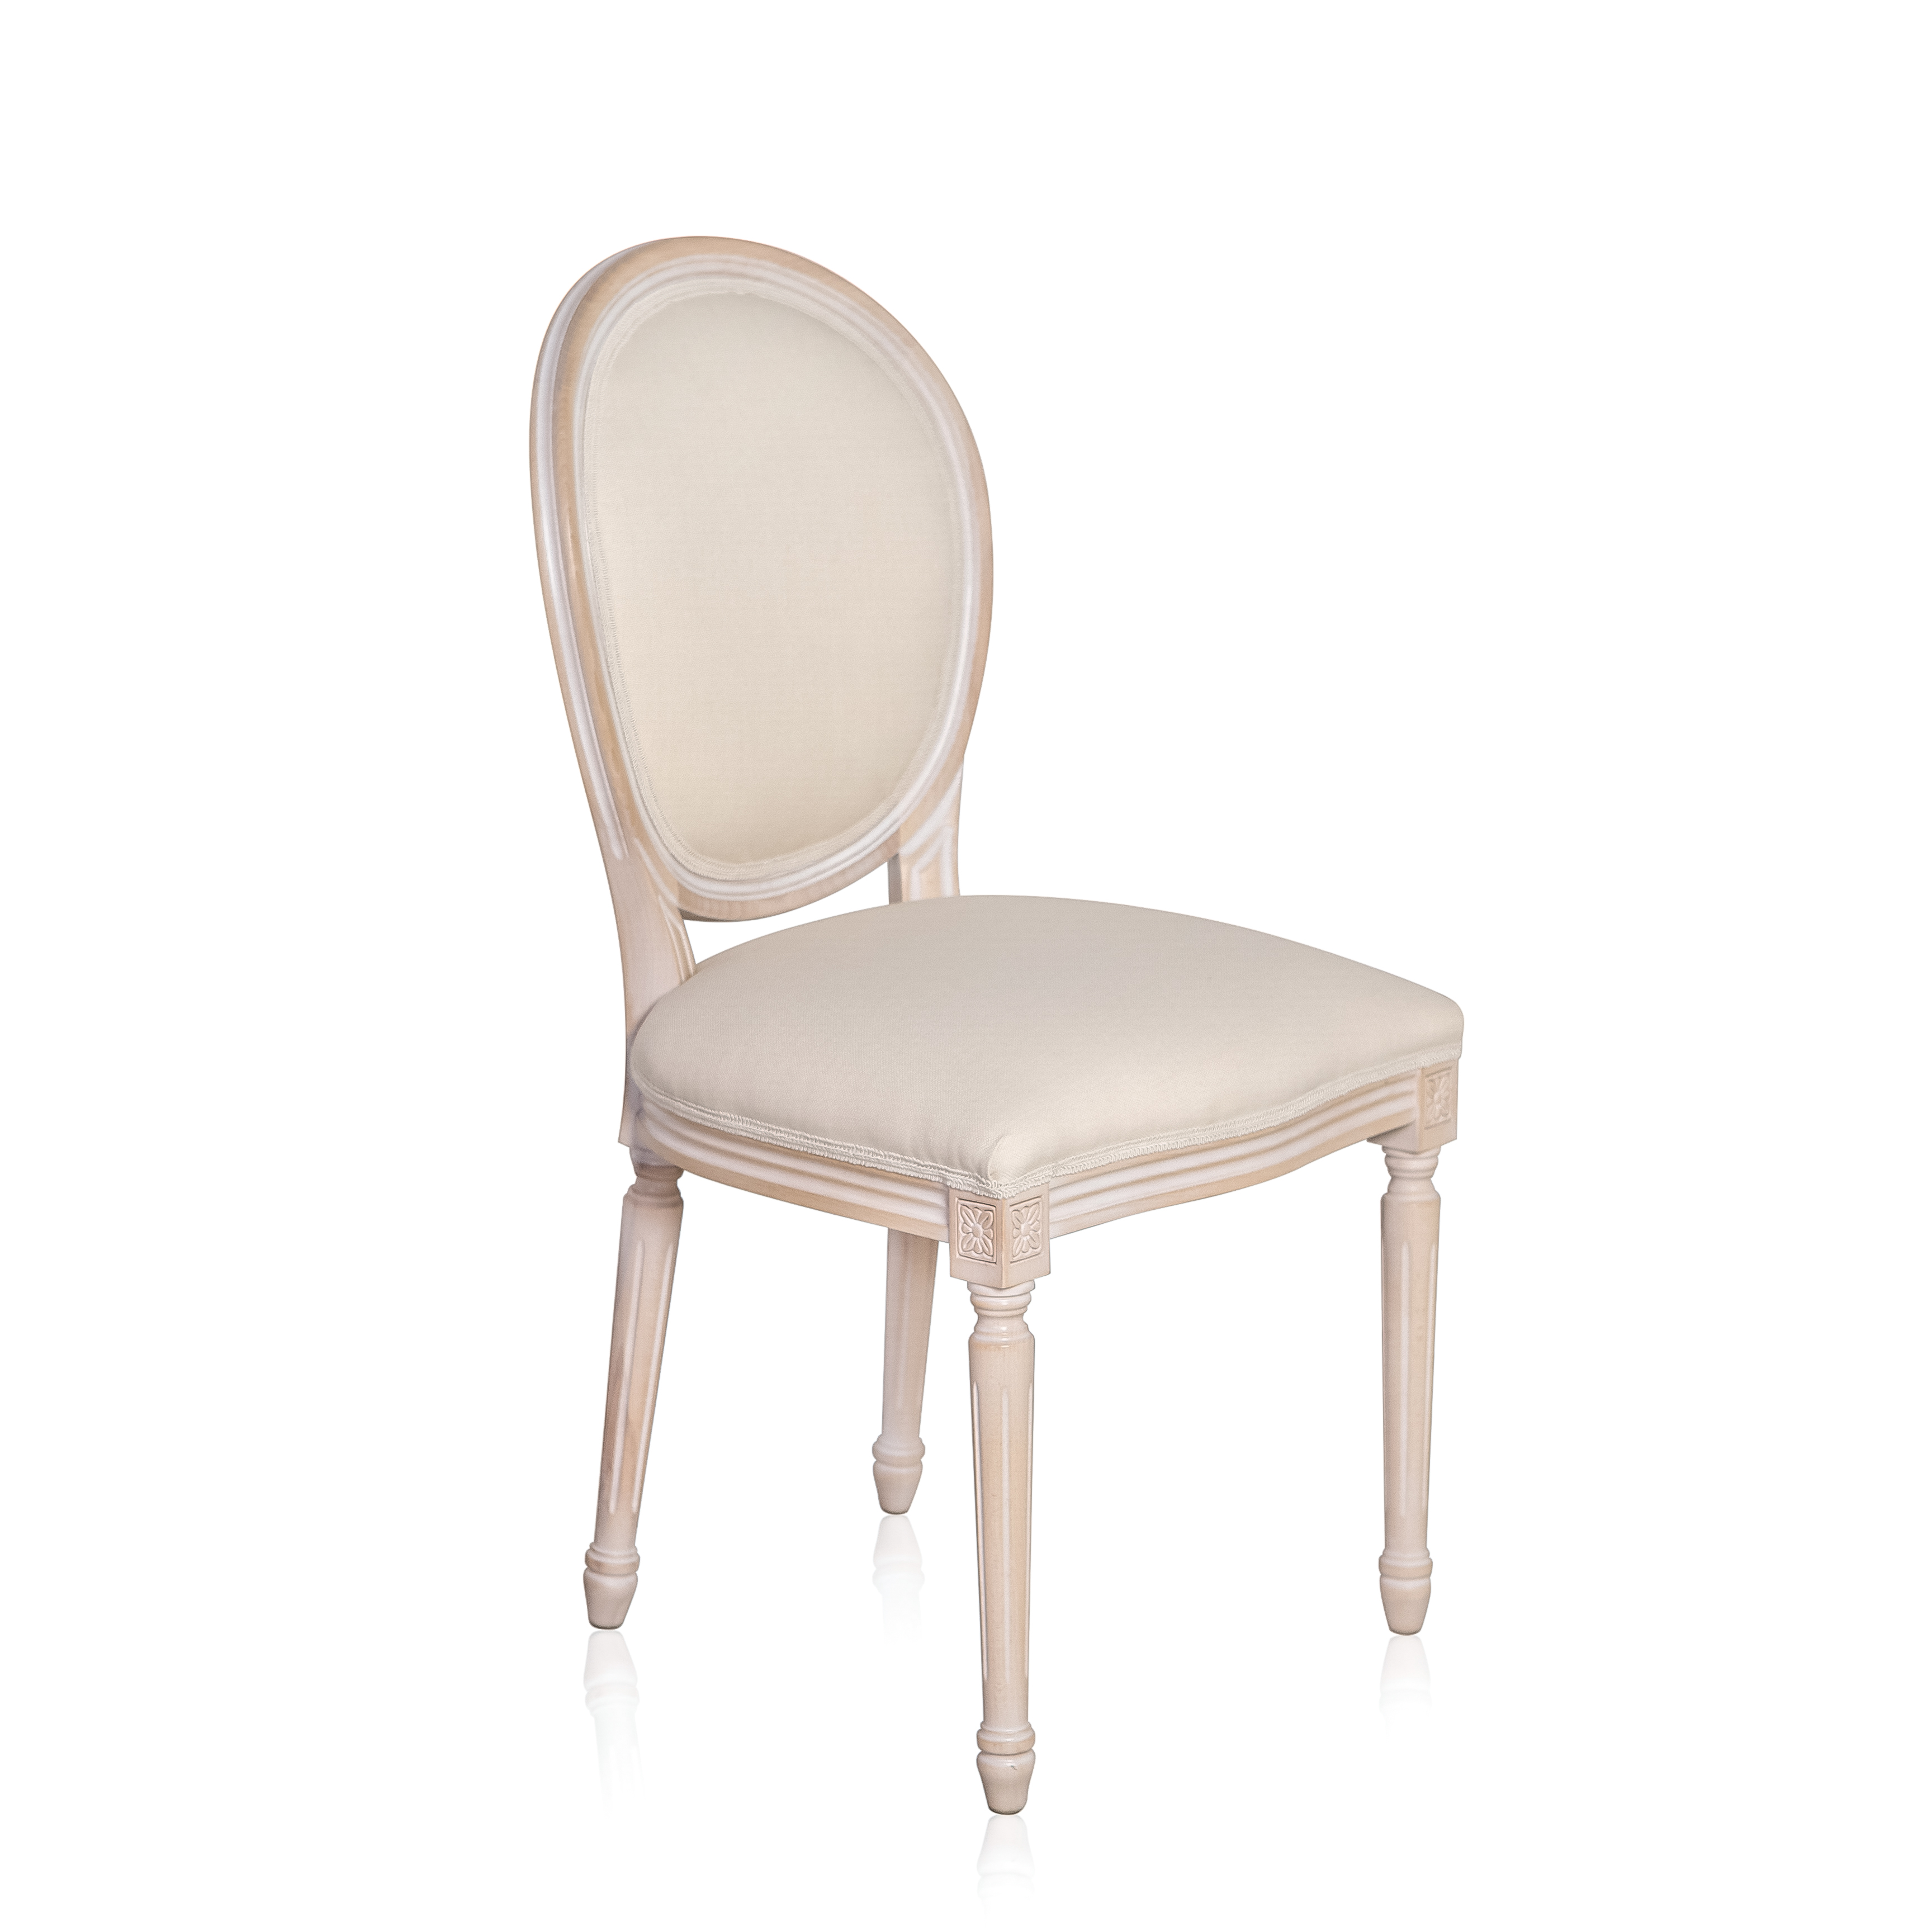 Medallion Chair  sc 1 st  Arutin Decor & Medallion Chair | Arutin Decor